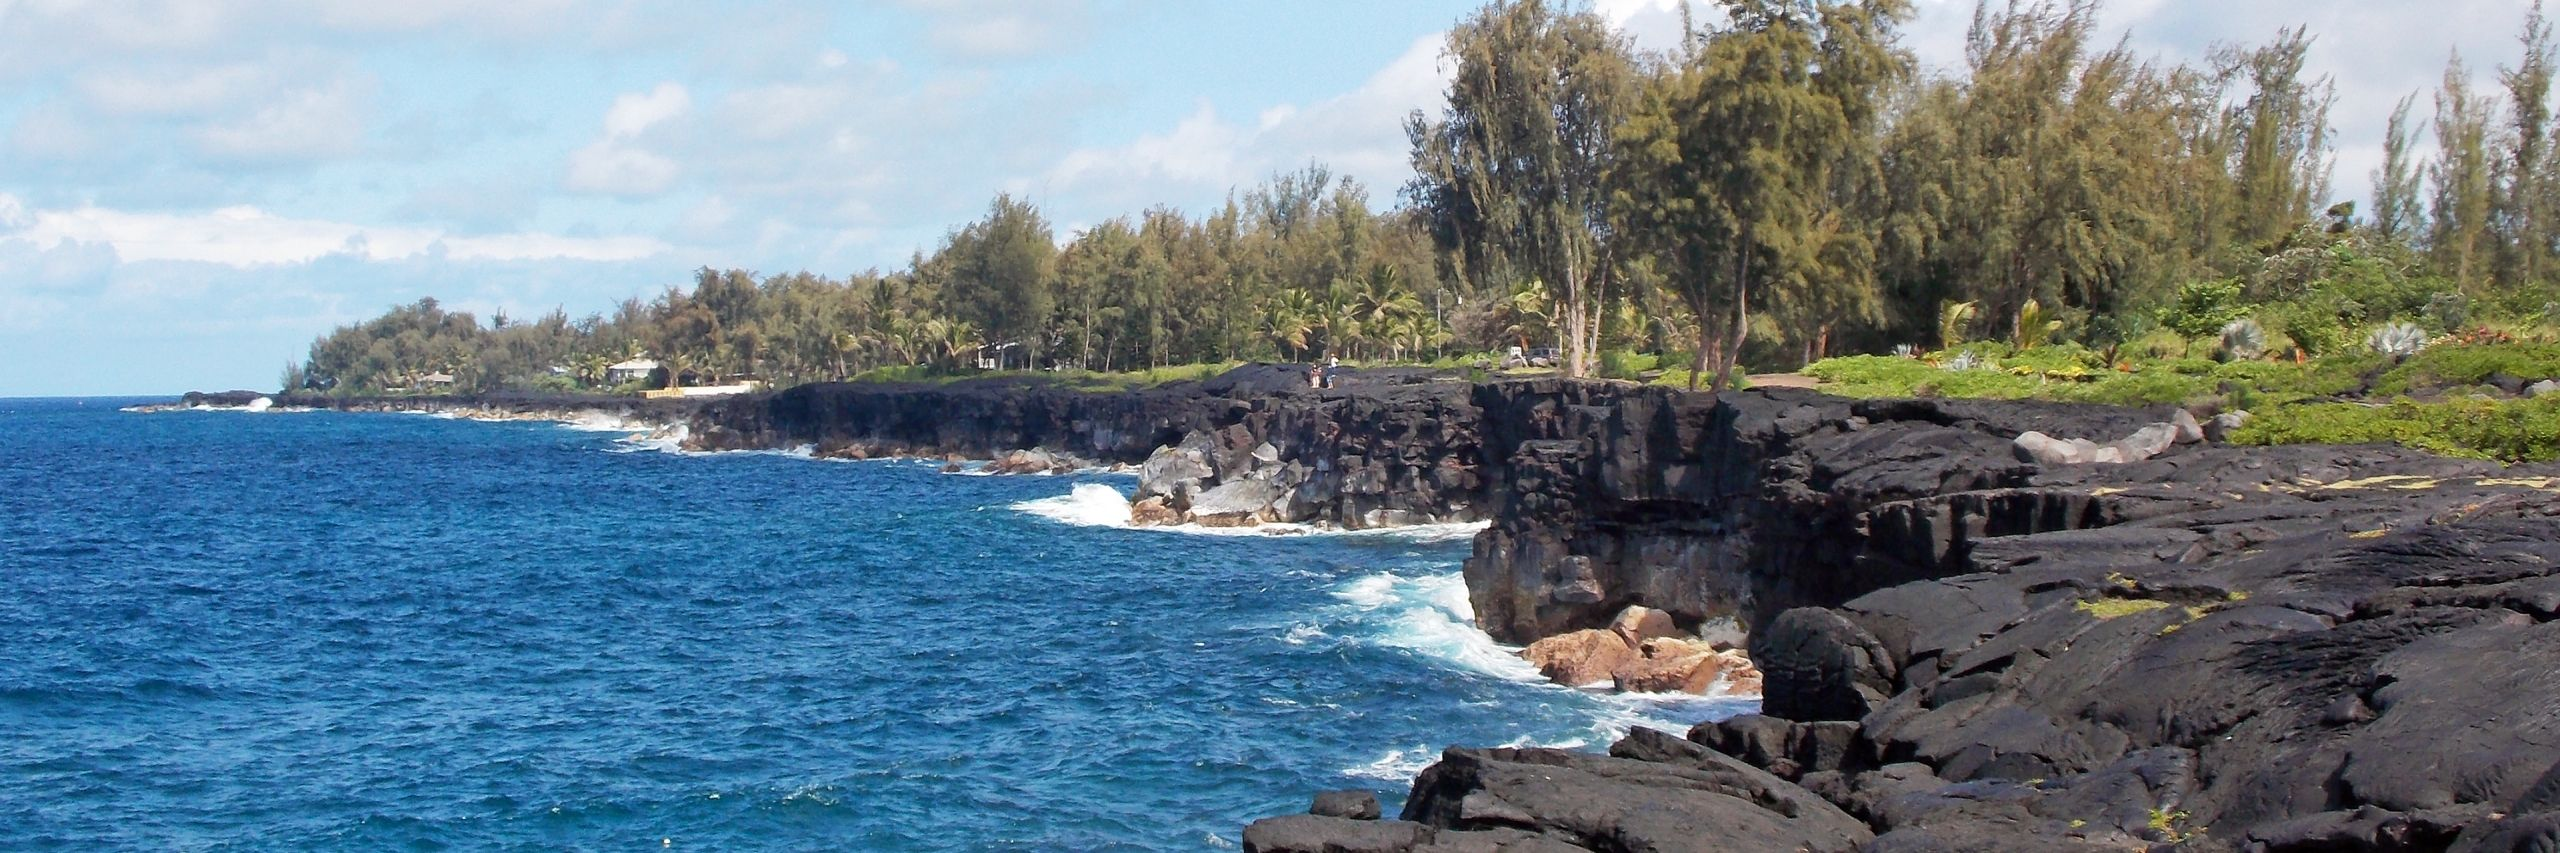 Personals in hawaiian paradise park hawaii